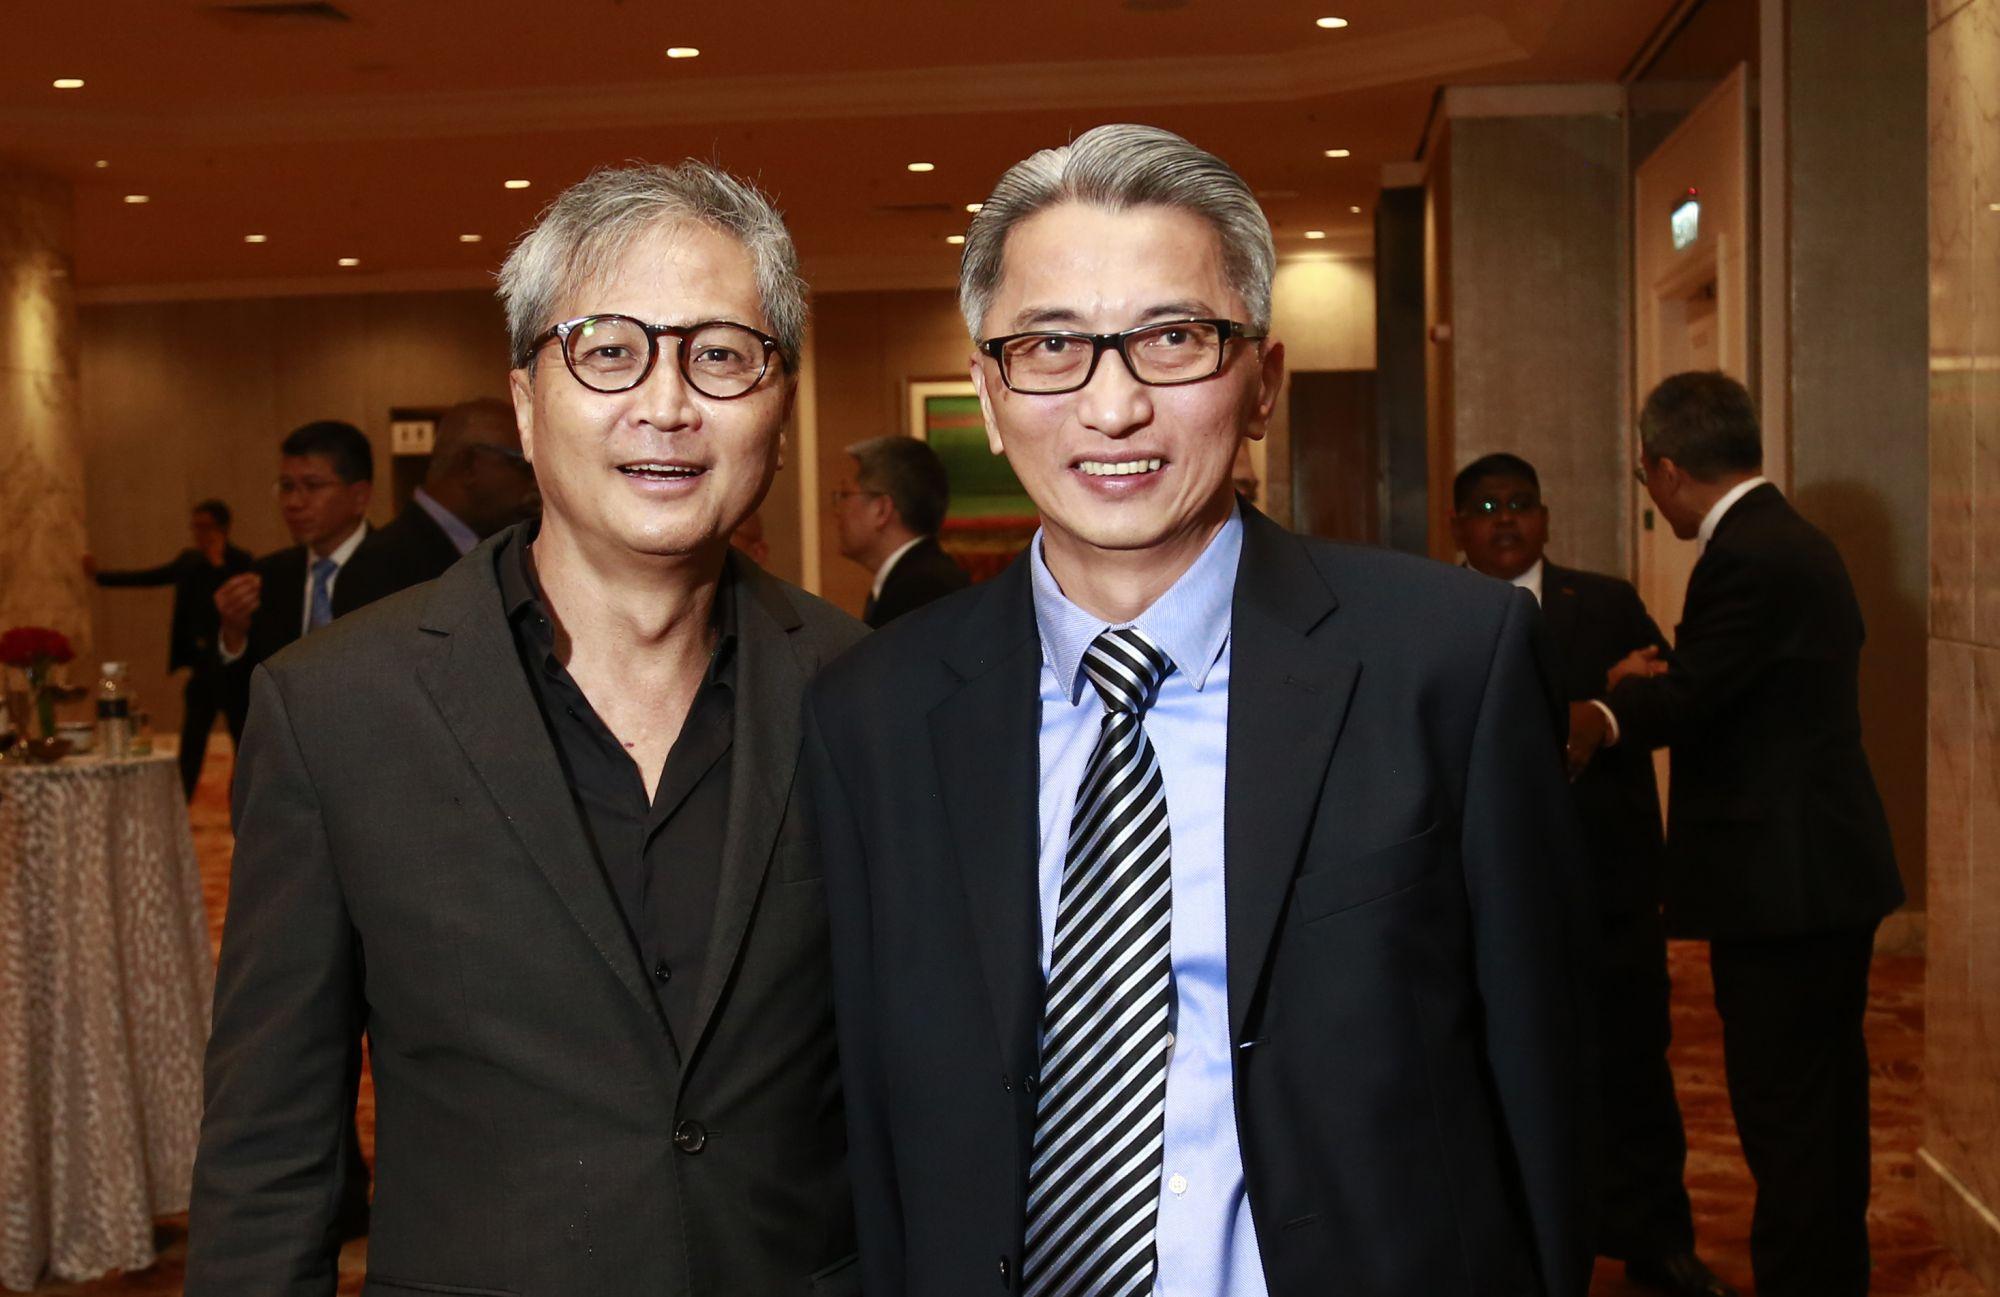 Leong Yew Kooi and Ong Ghee Bin